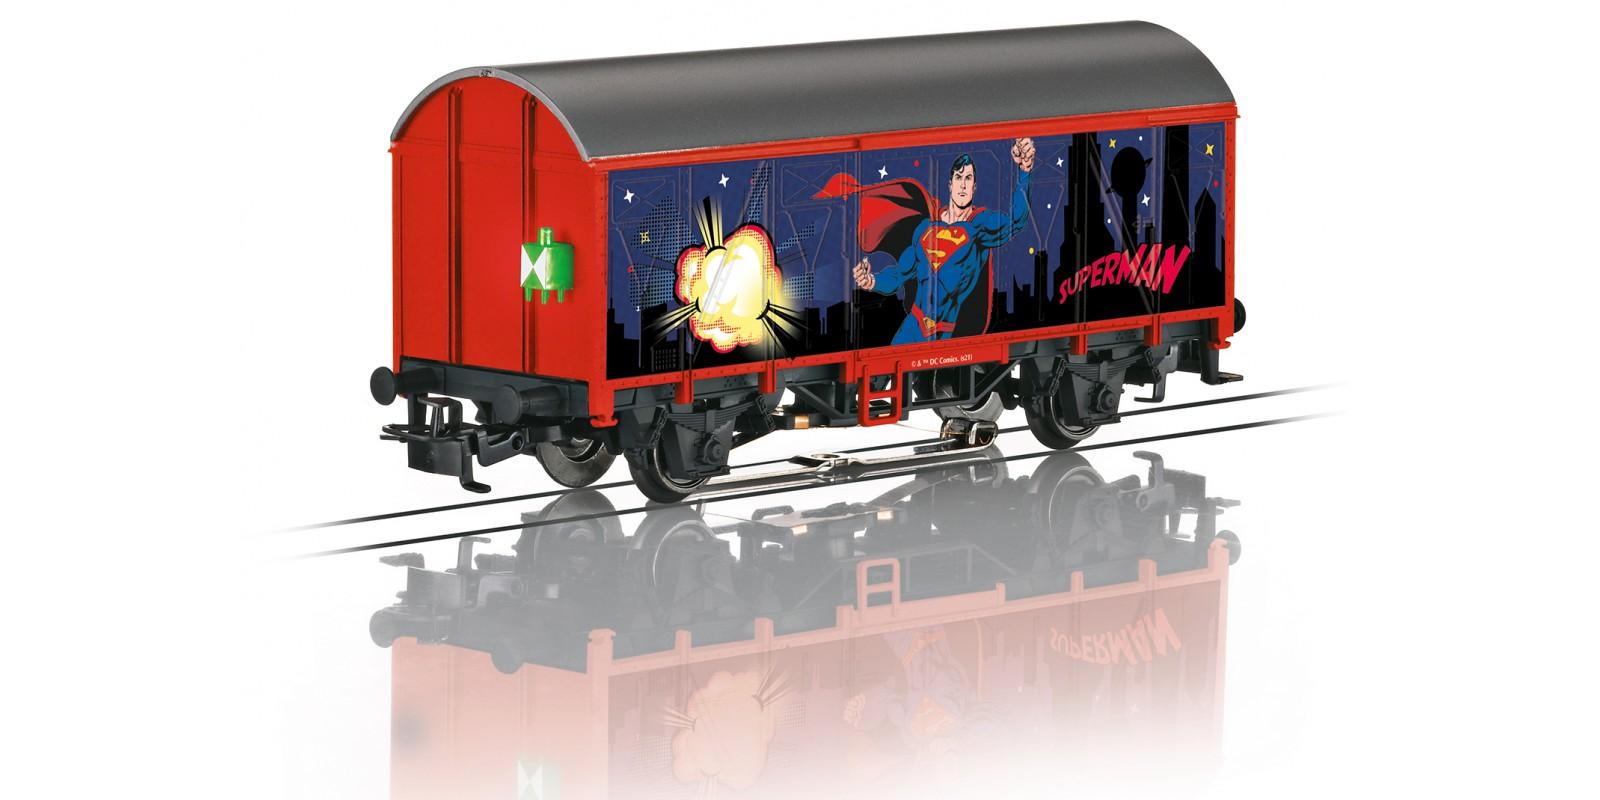 44825 Superman Boxcar